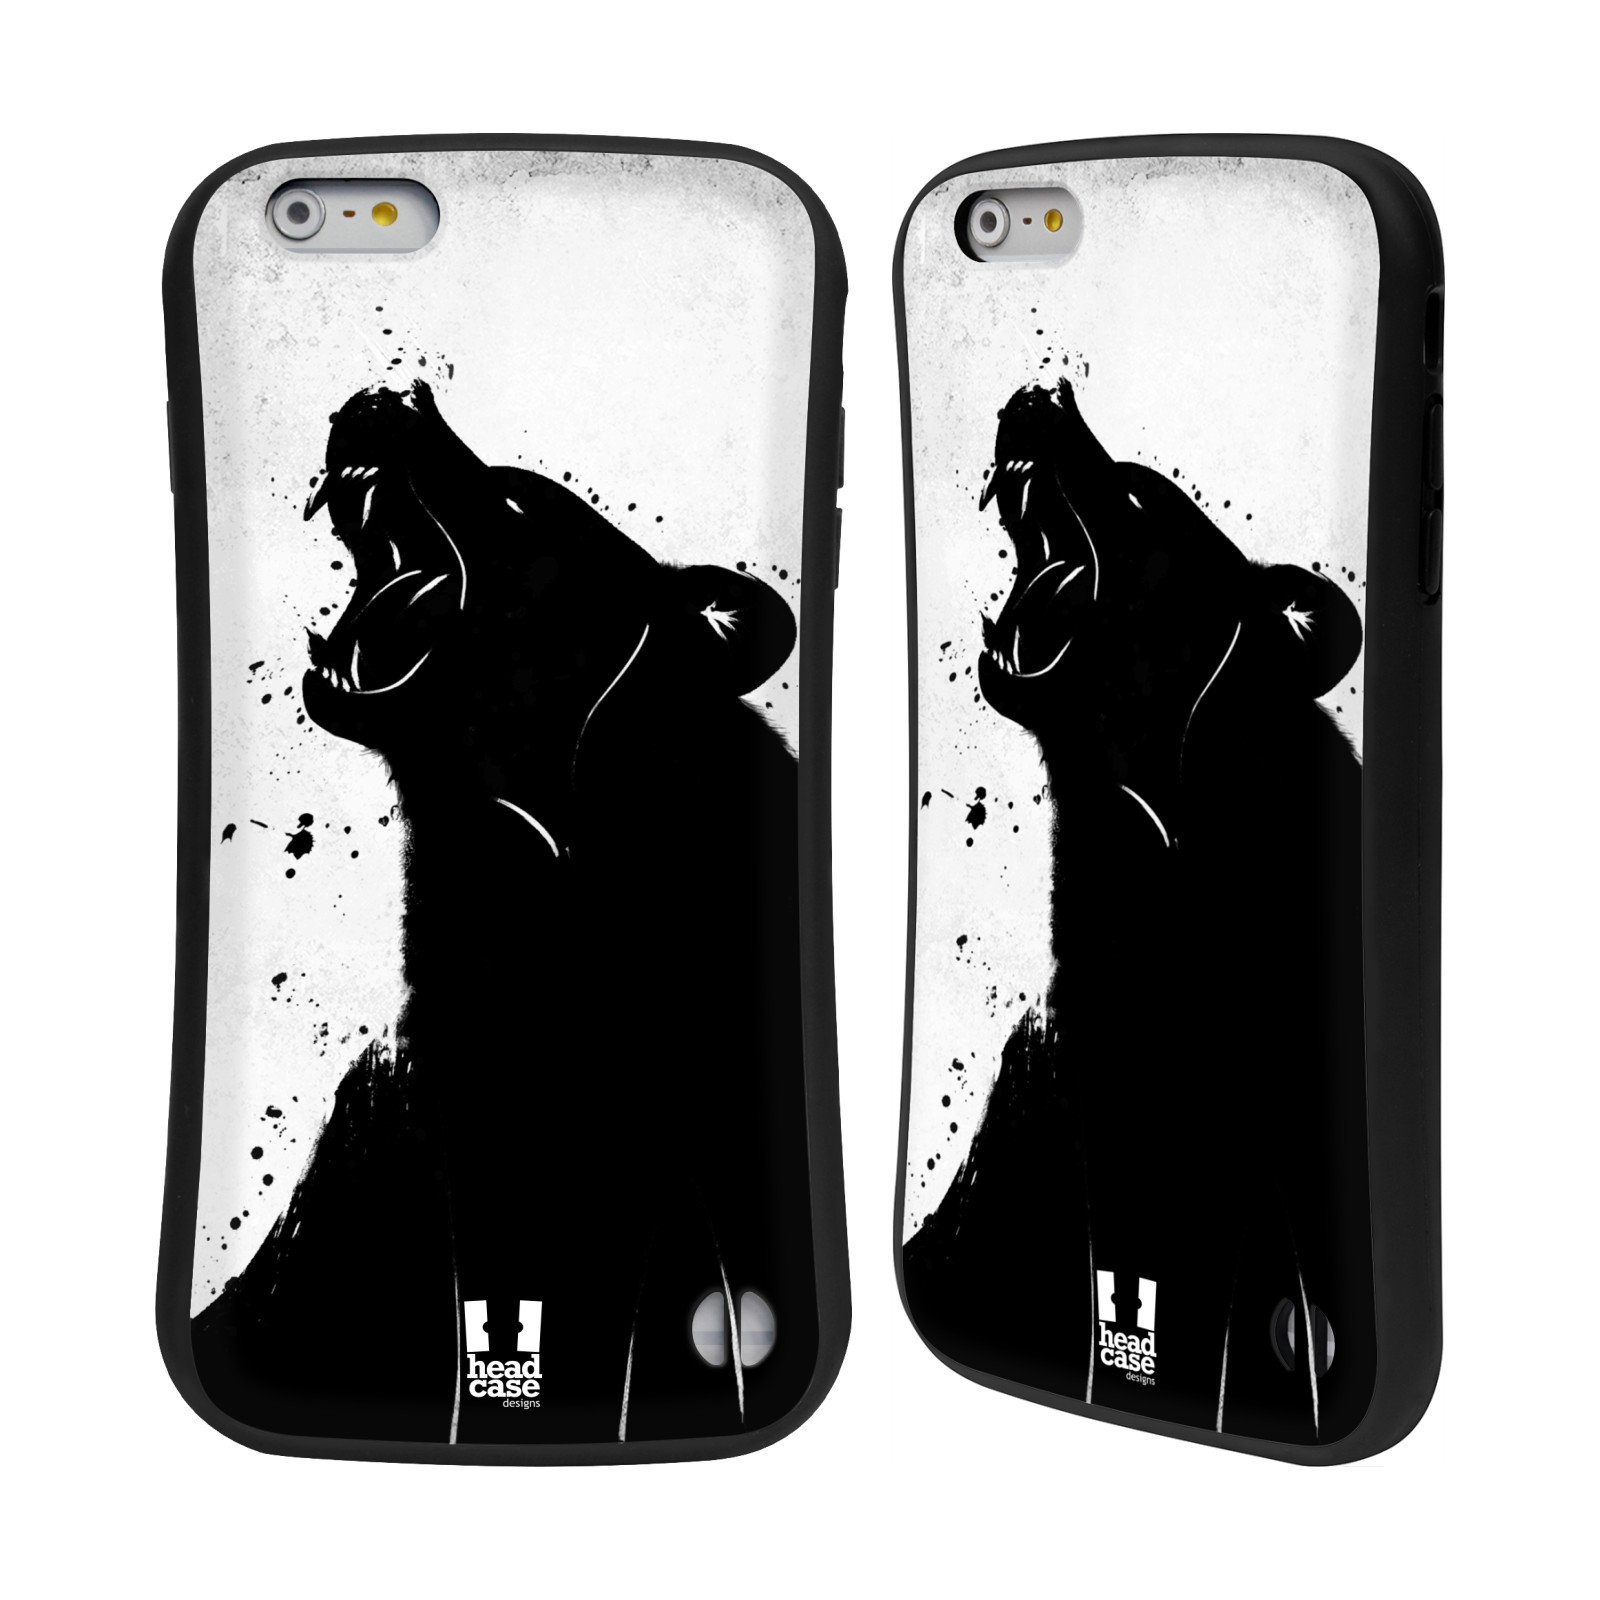 HEAD CASE silikon/plast odolný obal na mobil Apple Iphone 6 PLUS / 6S PLUS vzor Kresba tuš zvíře medvěd